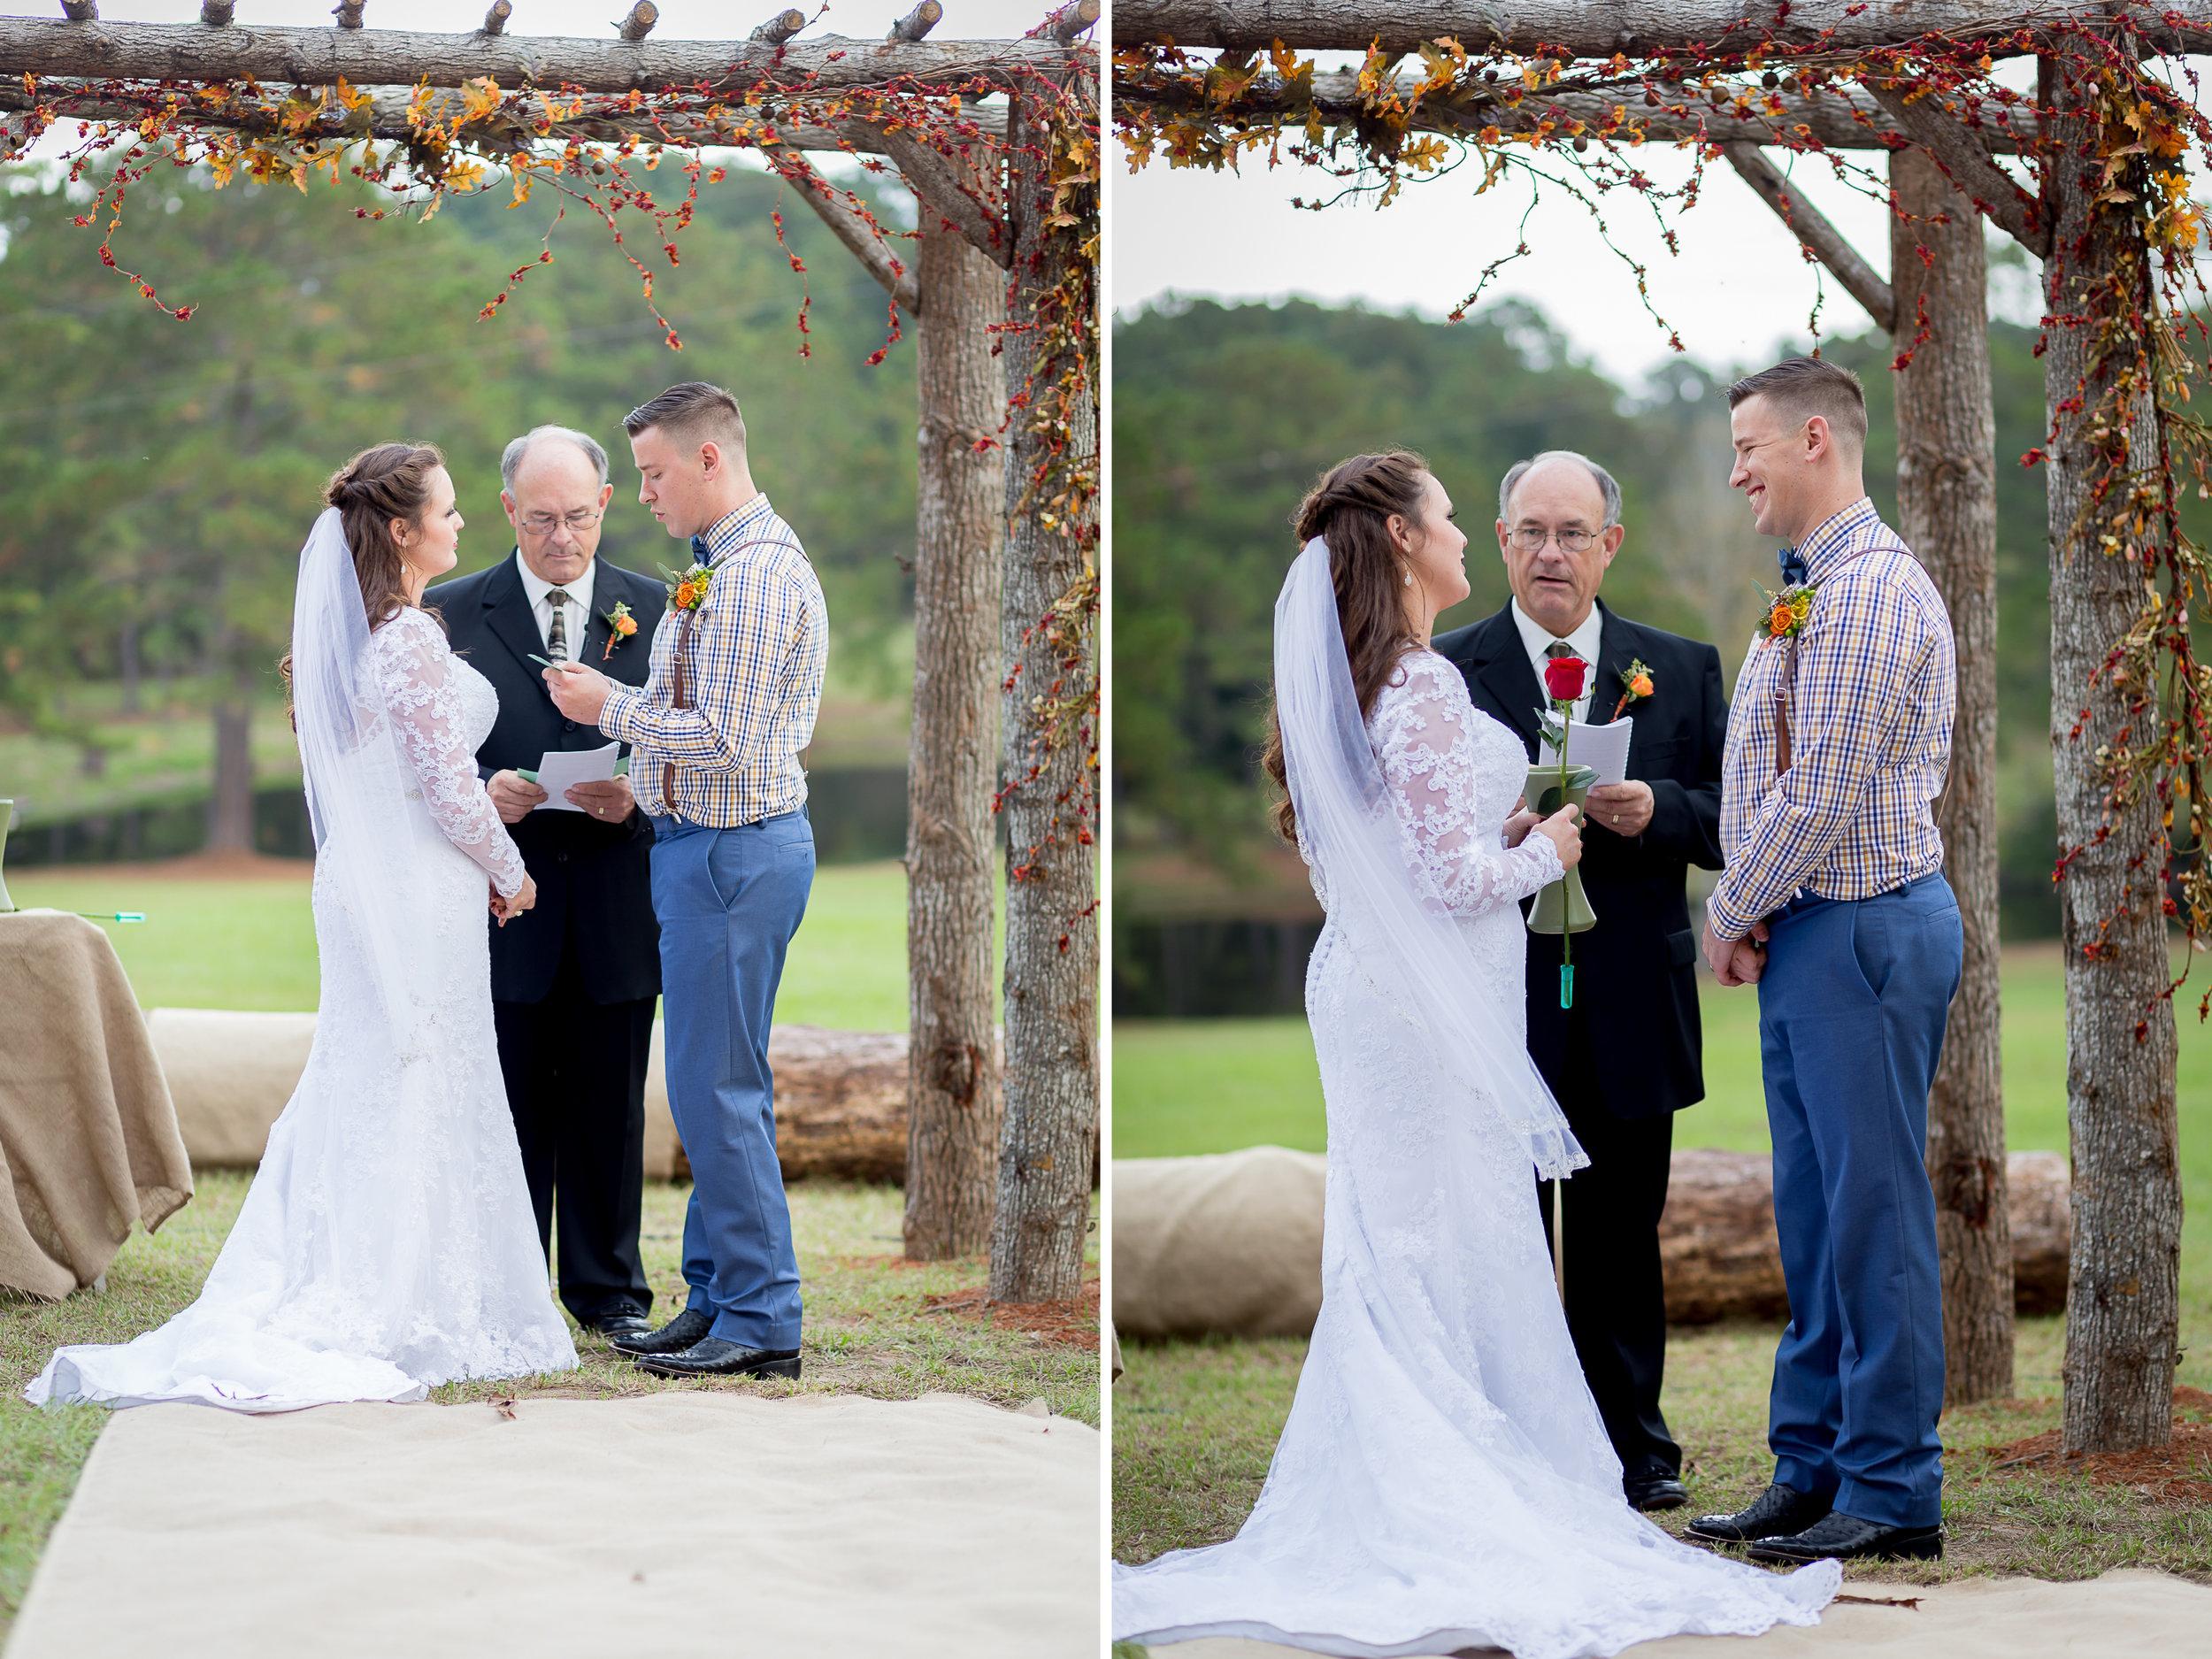 Nerdahl Wedding 40.jpg